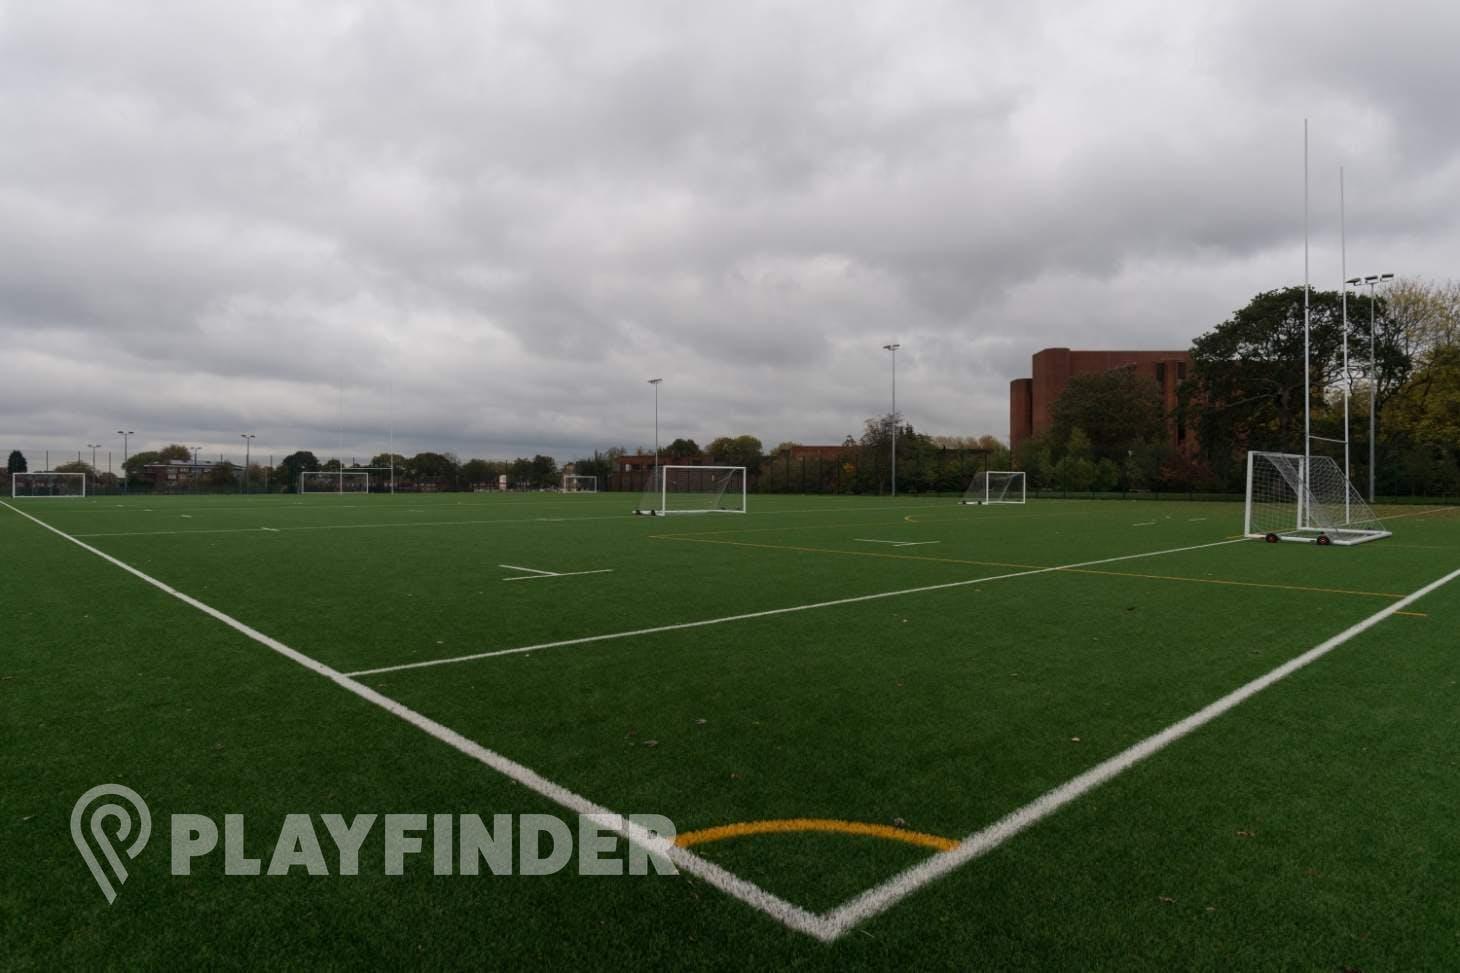 Manchester Enterprise Academy Wythenshawe 7 a side | 3G Astroturf football pitch